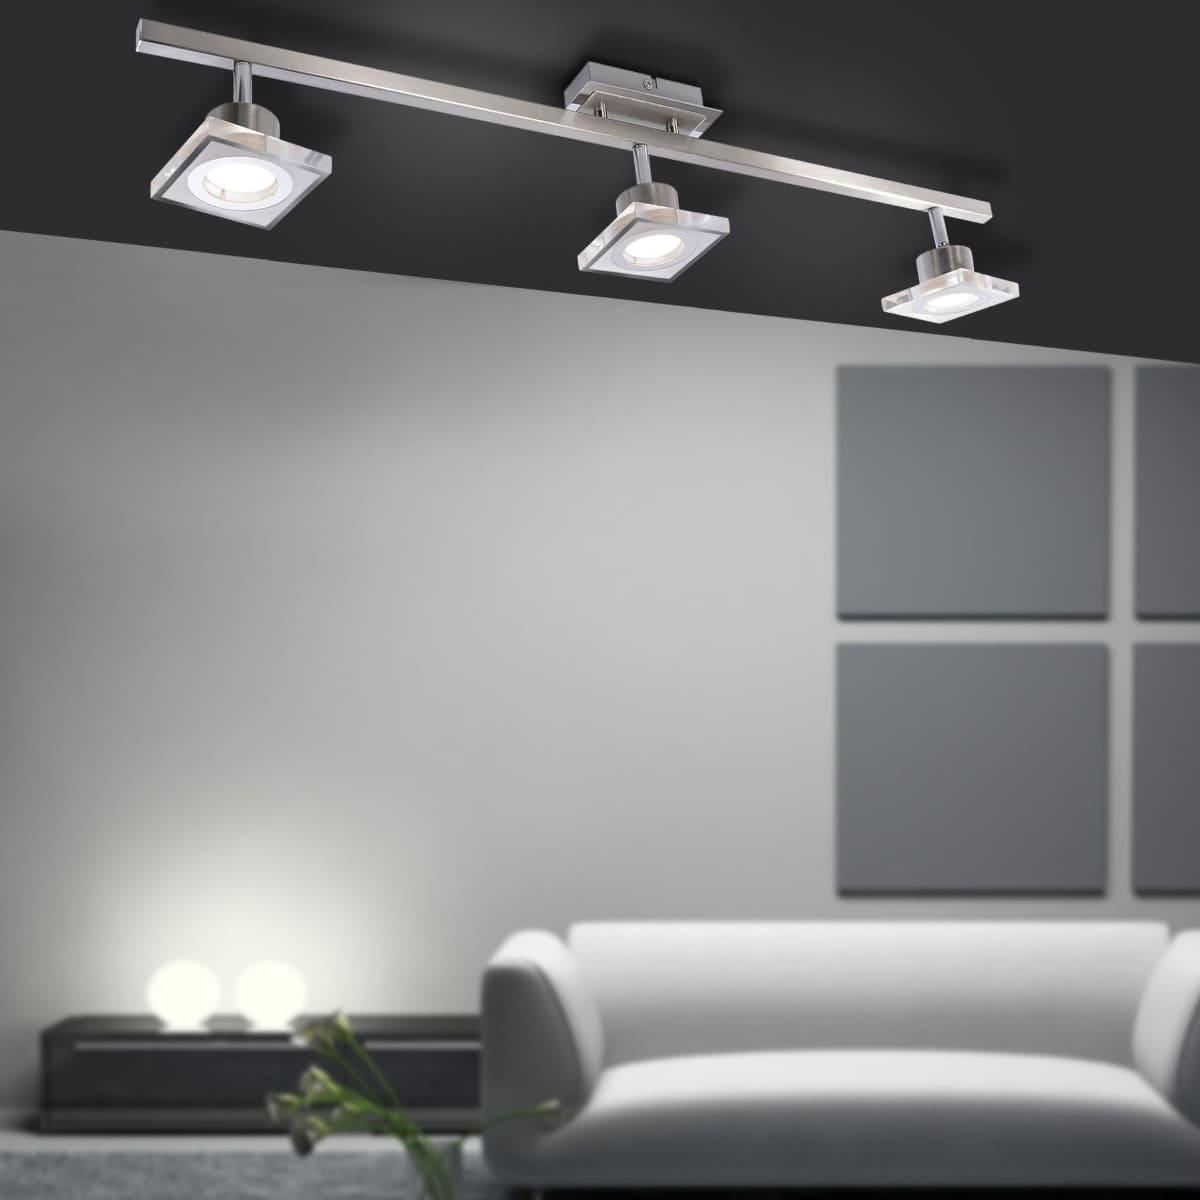 LED Deckenleuchte, Strahler, 3-flammig, stahl